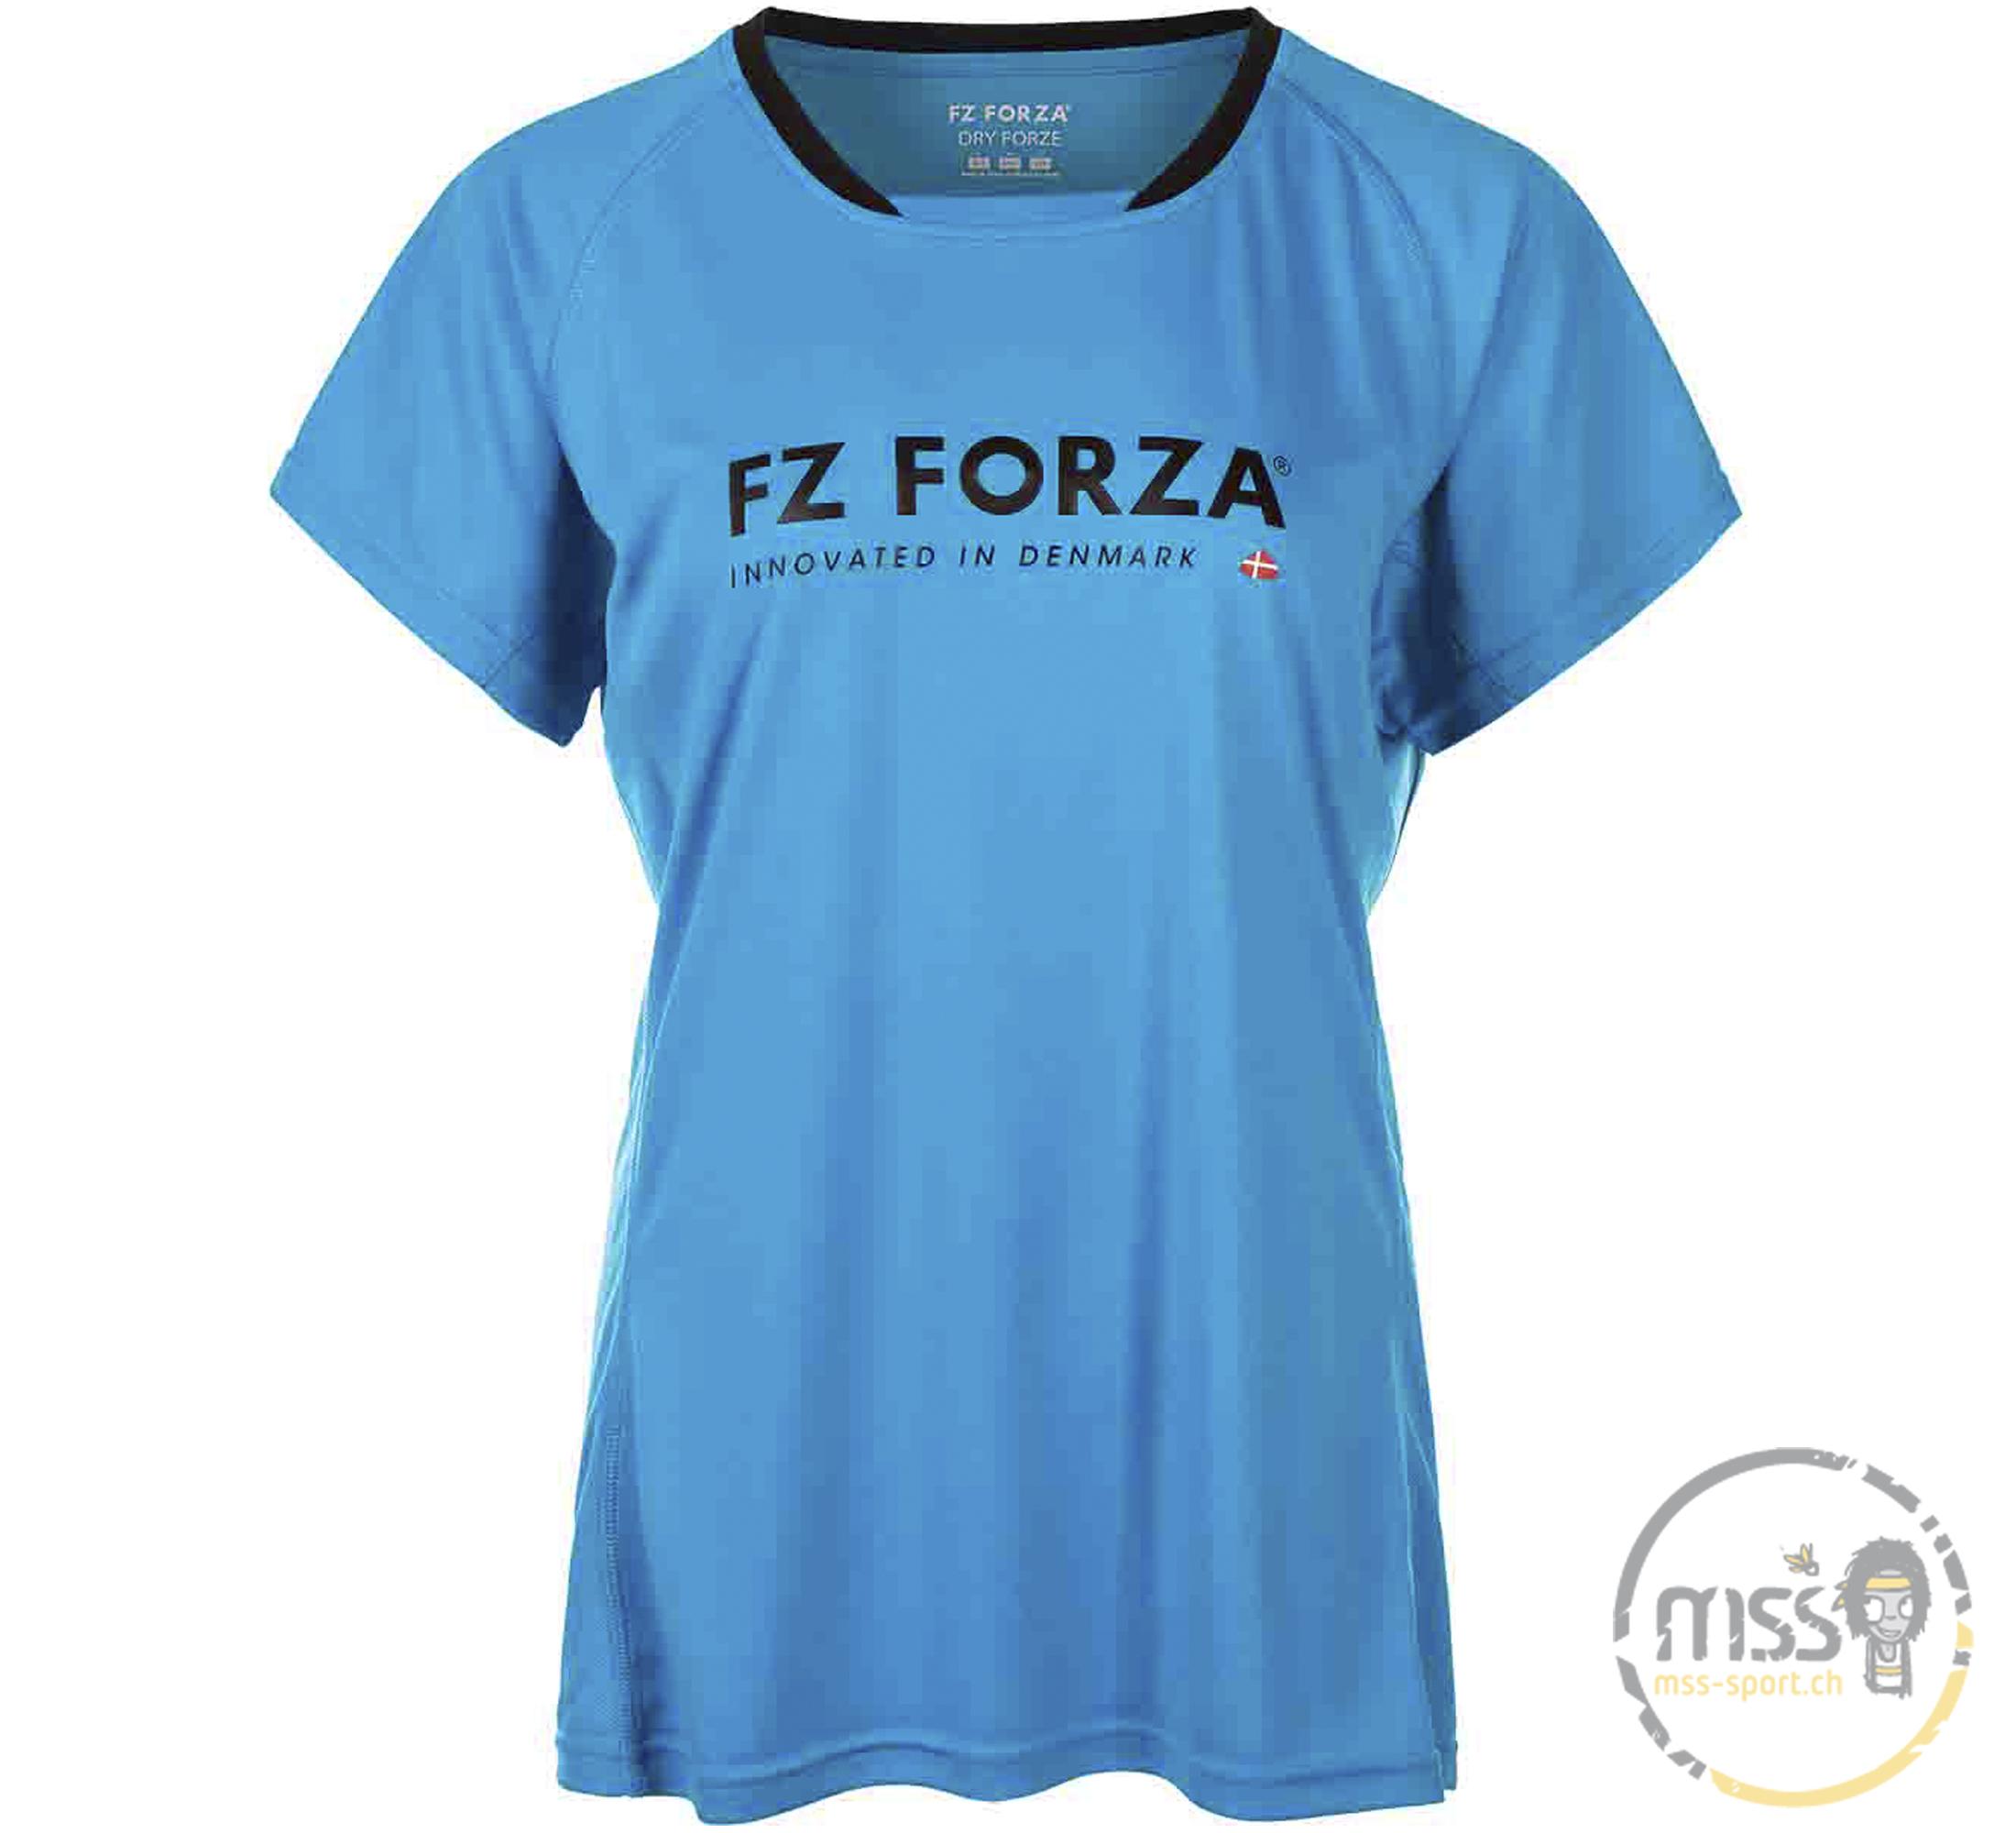 Forza Shirt Blingley Tee atomic blue Lady